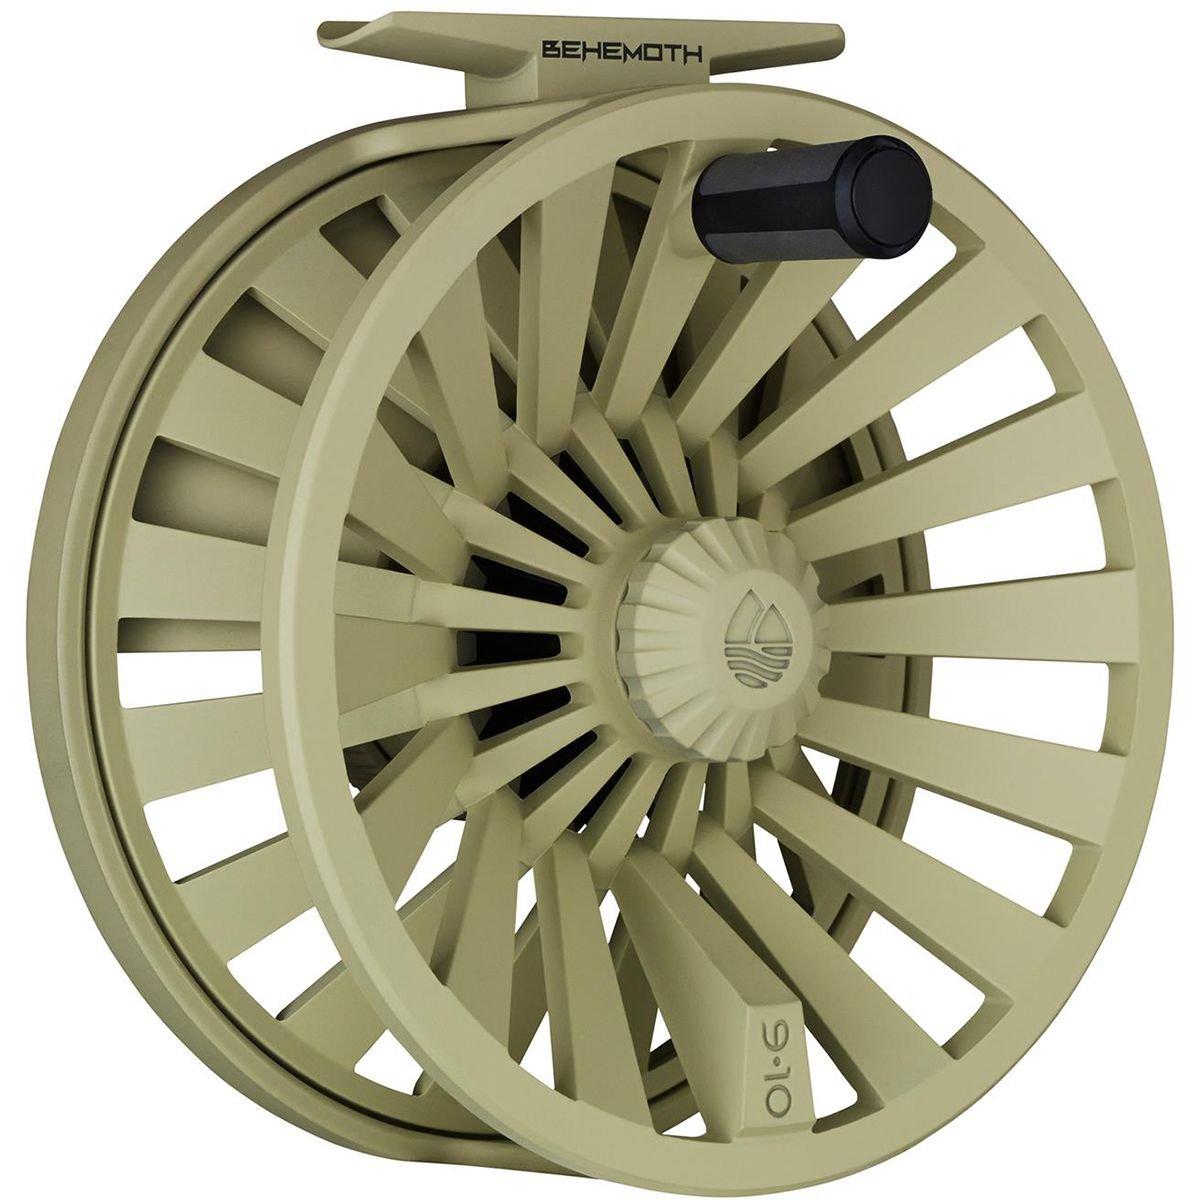 (11/12, Desert) - Redington Behemoth Series Fly Reel - Spool   B075KYHFJX